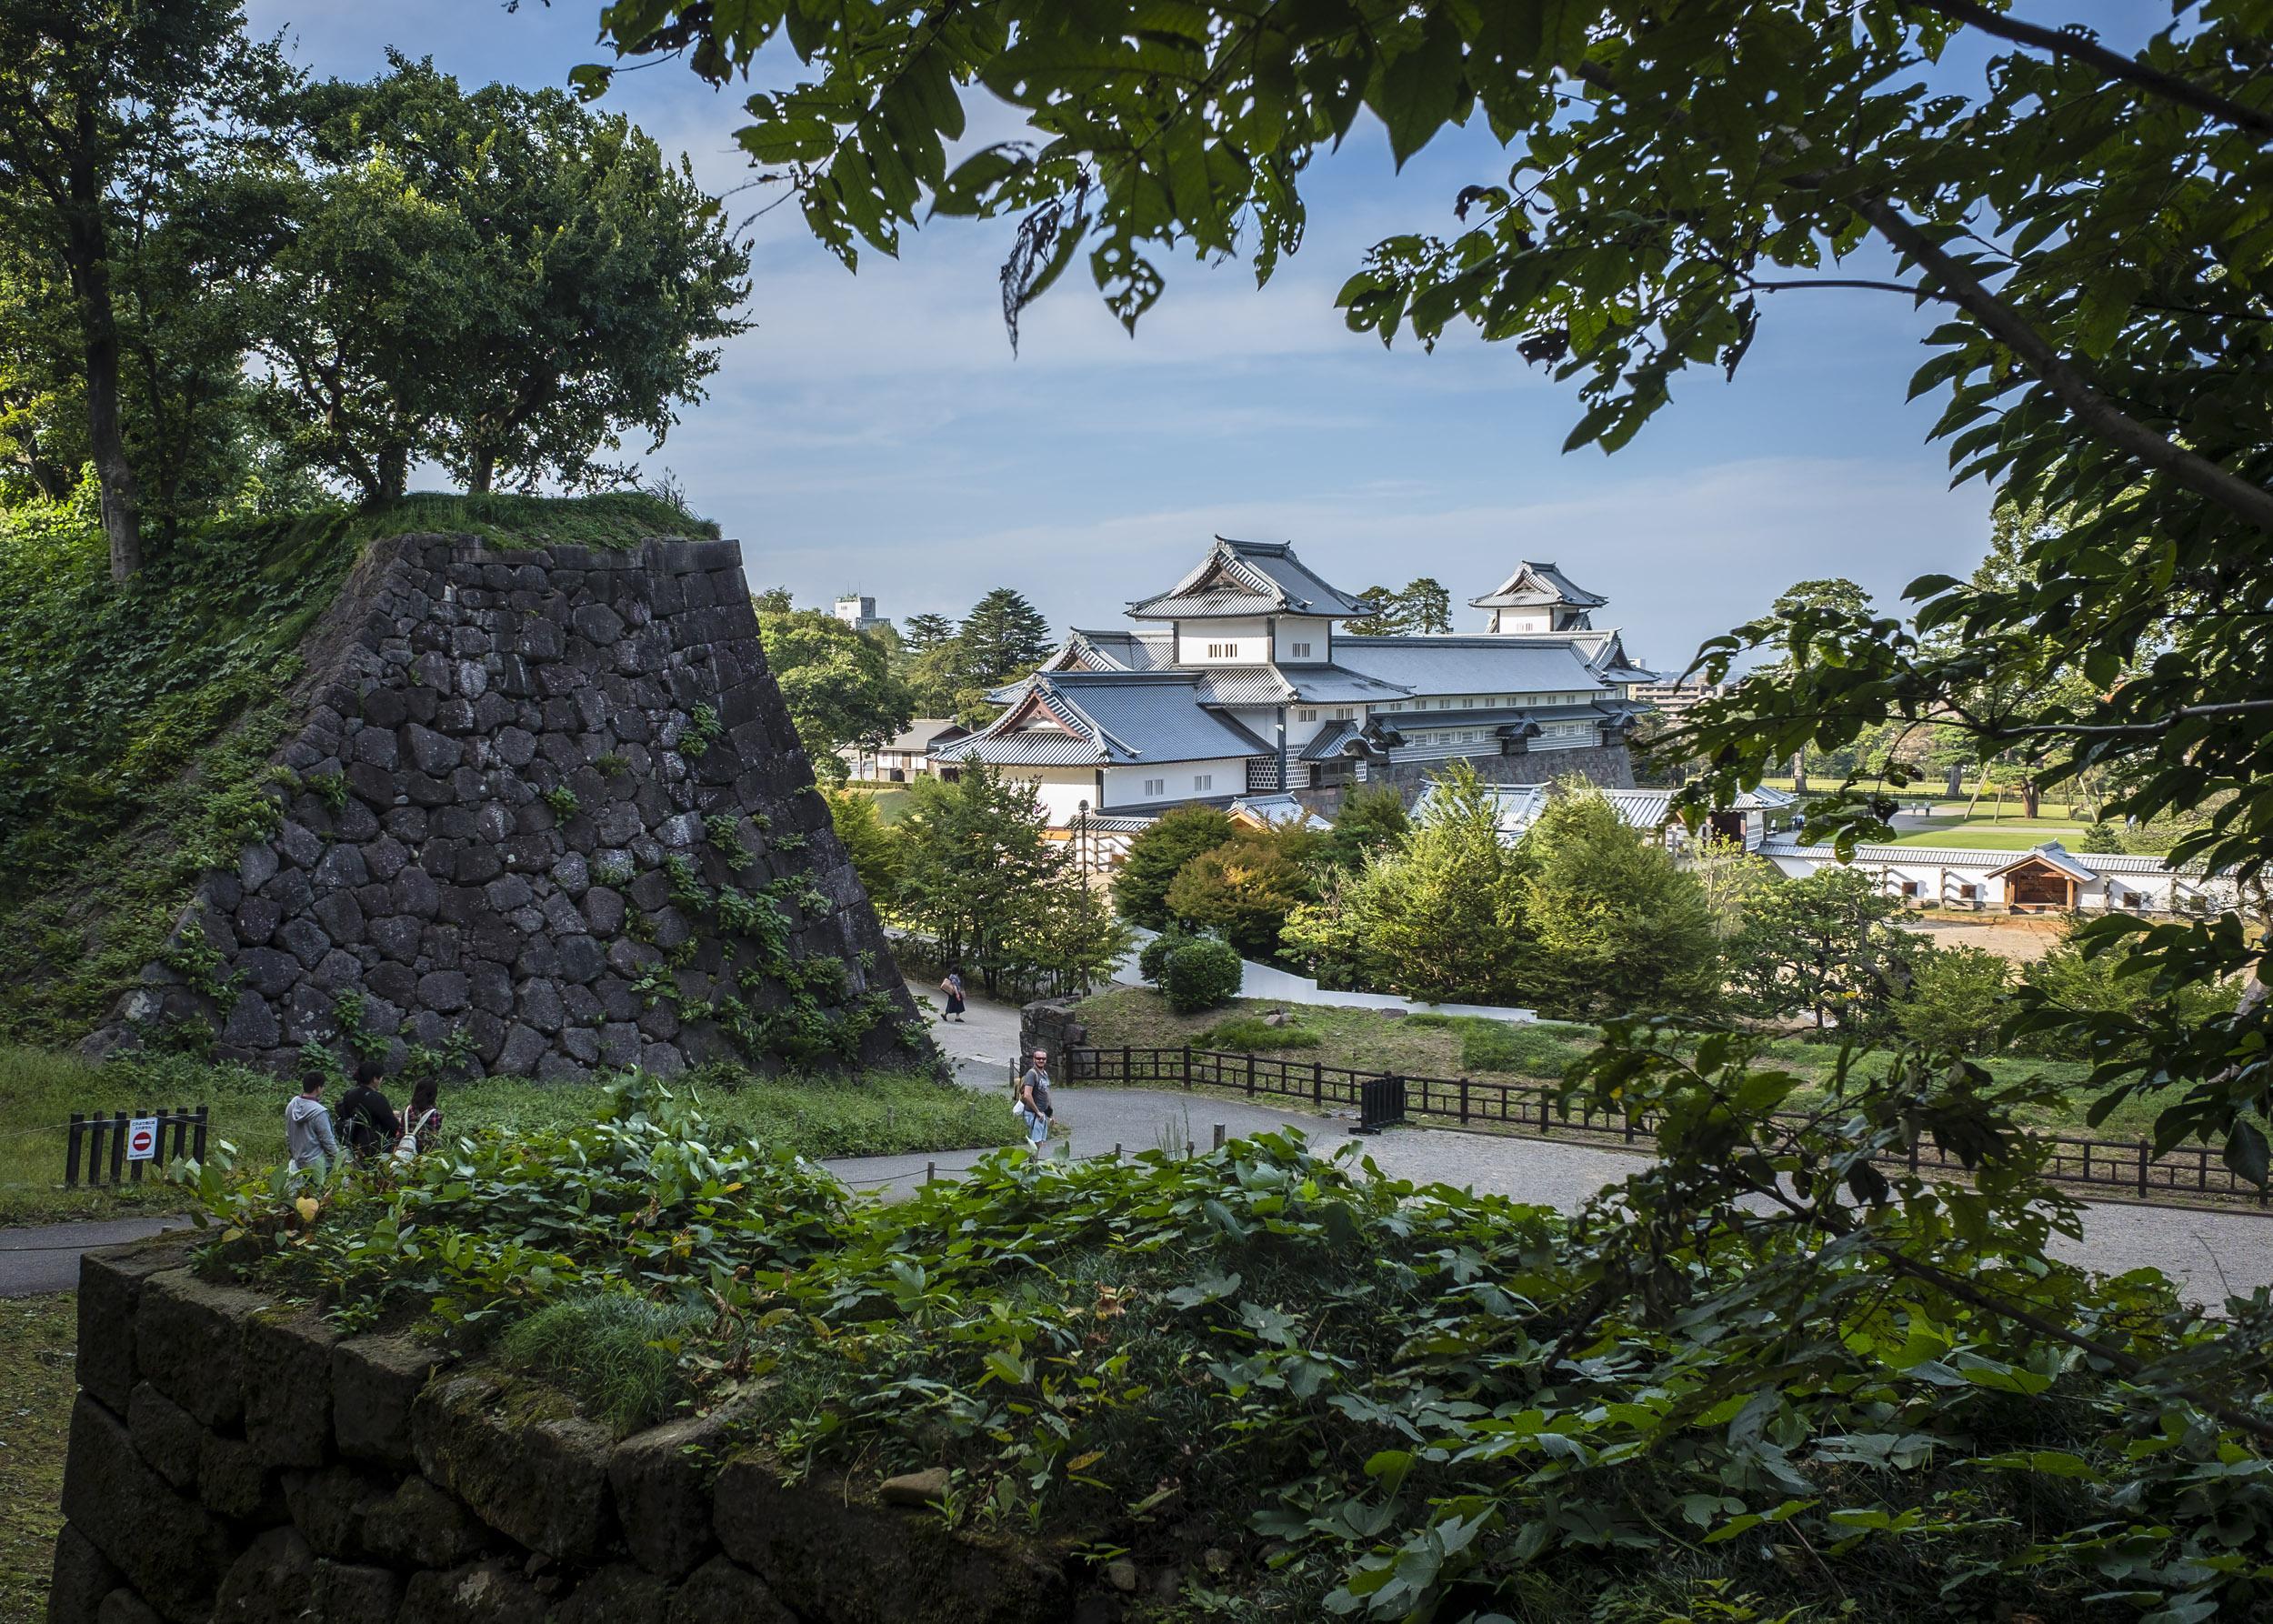 glenn vanderbeke, landschapsfotograaf, reisfotograaf, reisfotografie, japan, kanazawa castle